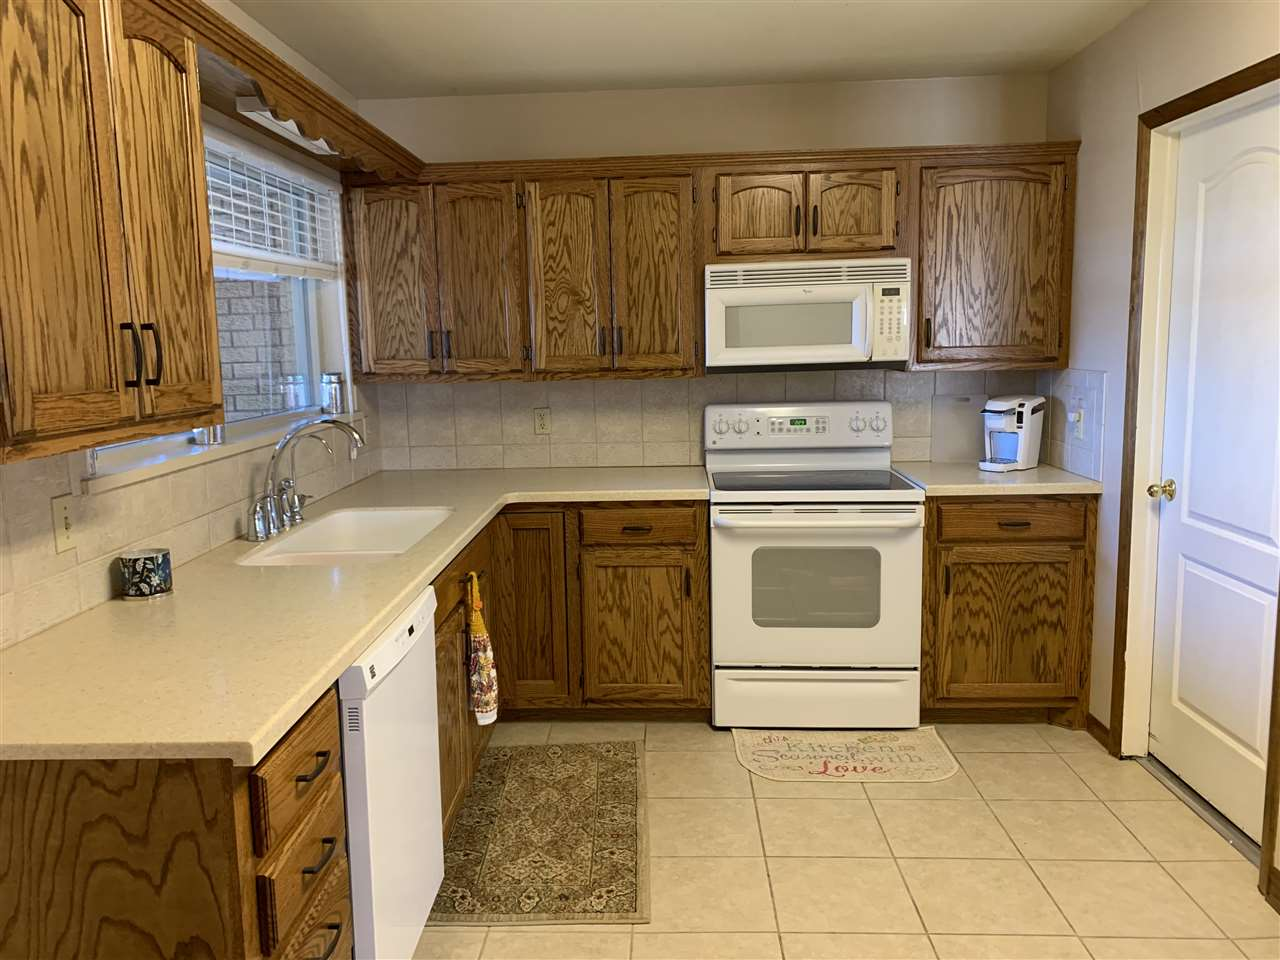 Sold Intraoffice W/MLS | 114 S Peach Newkirk, OK 74647 9